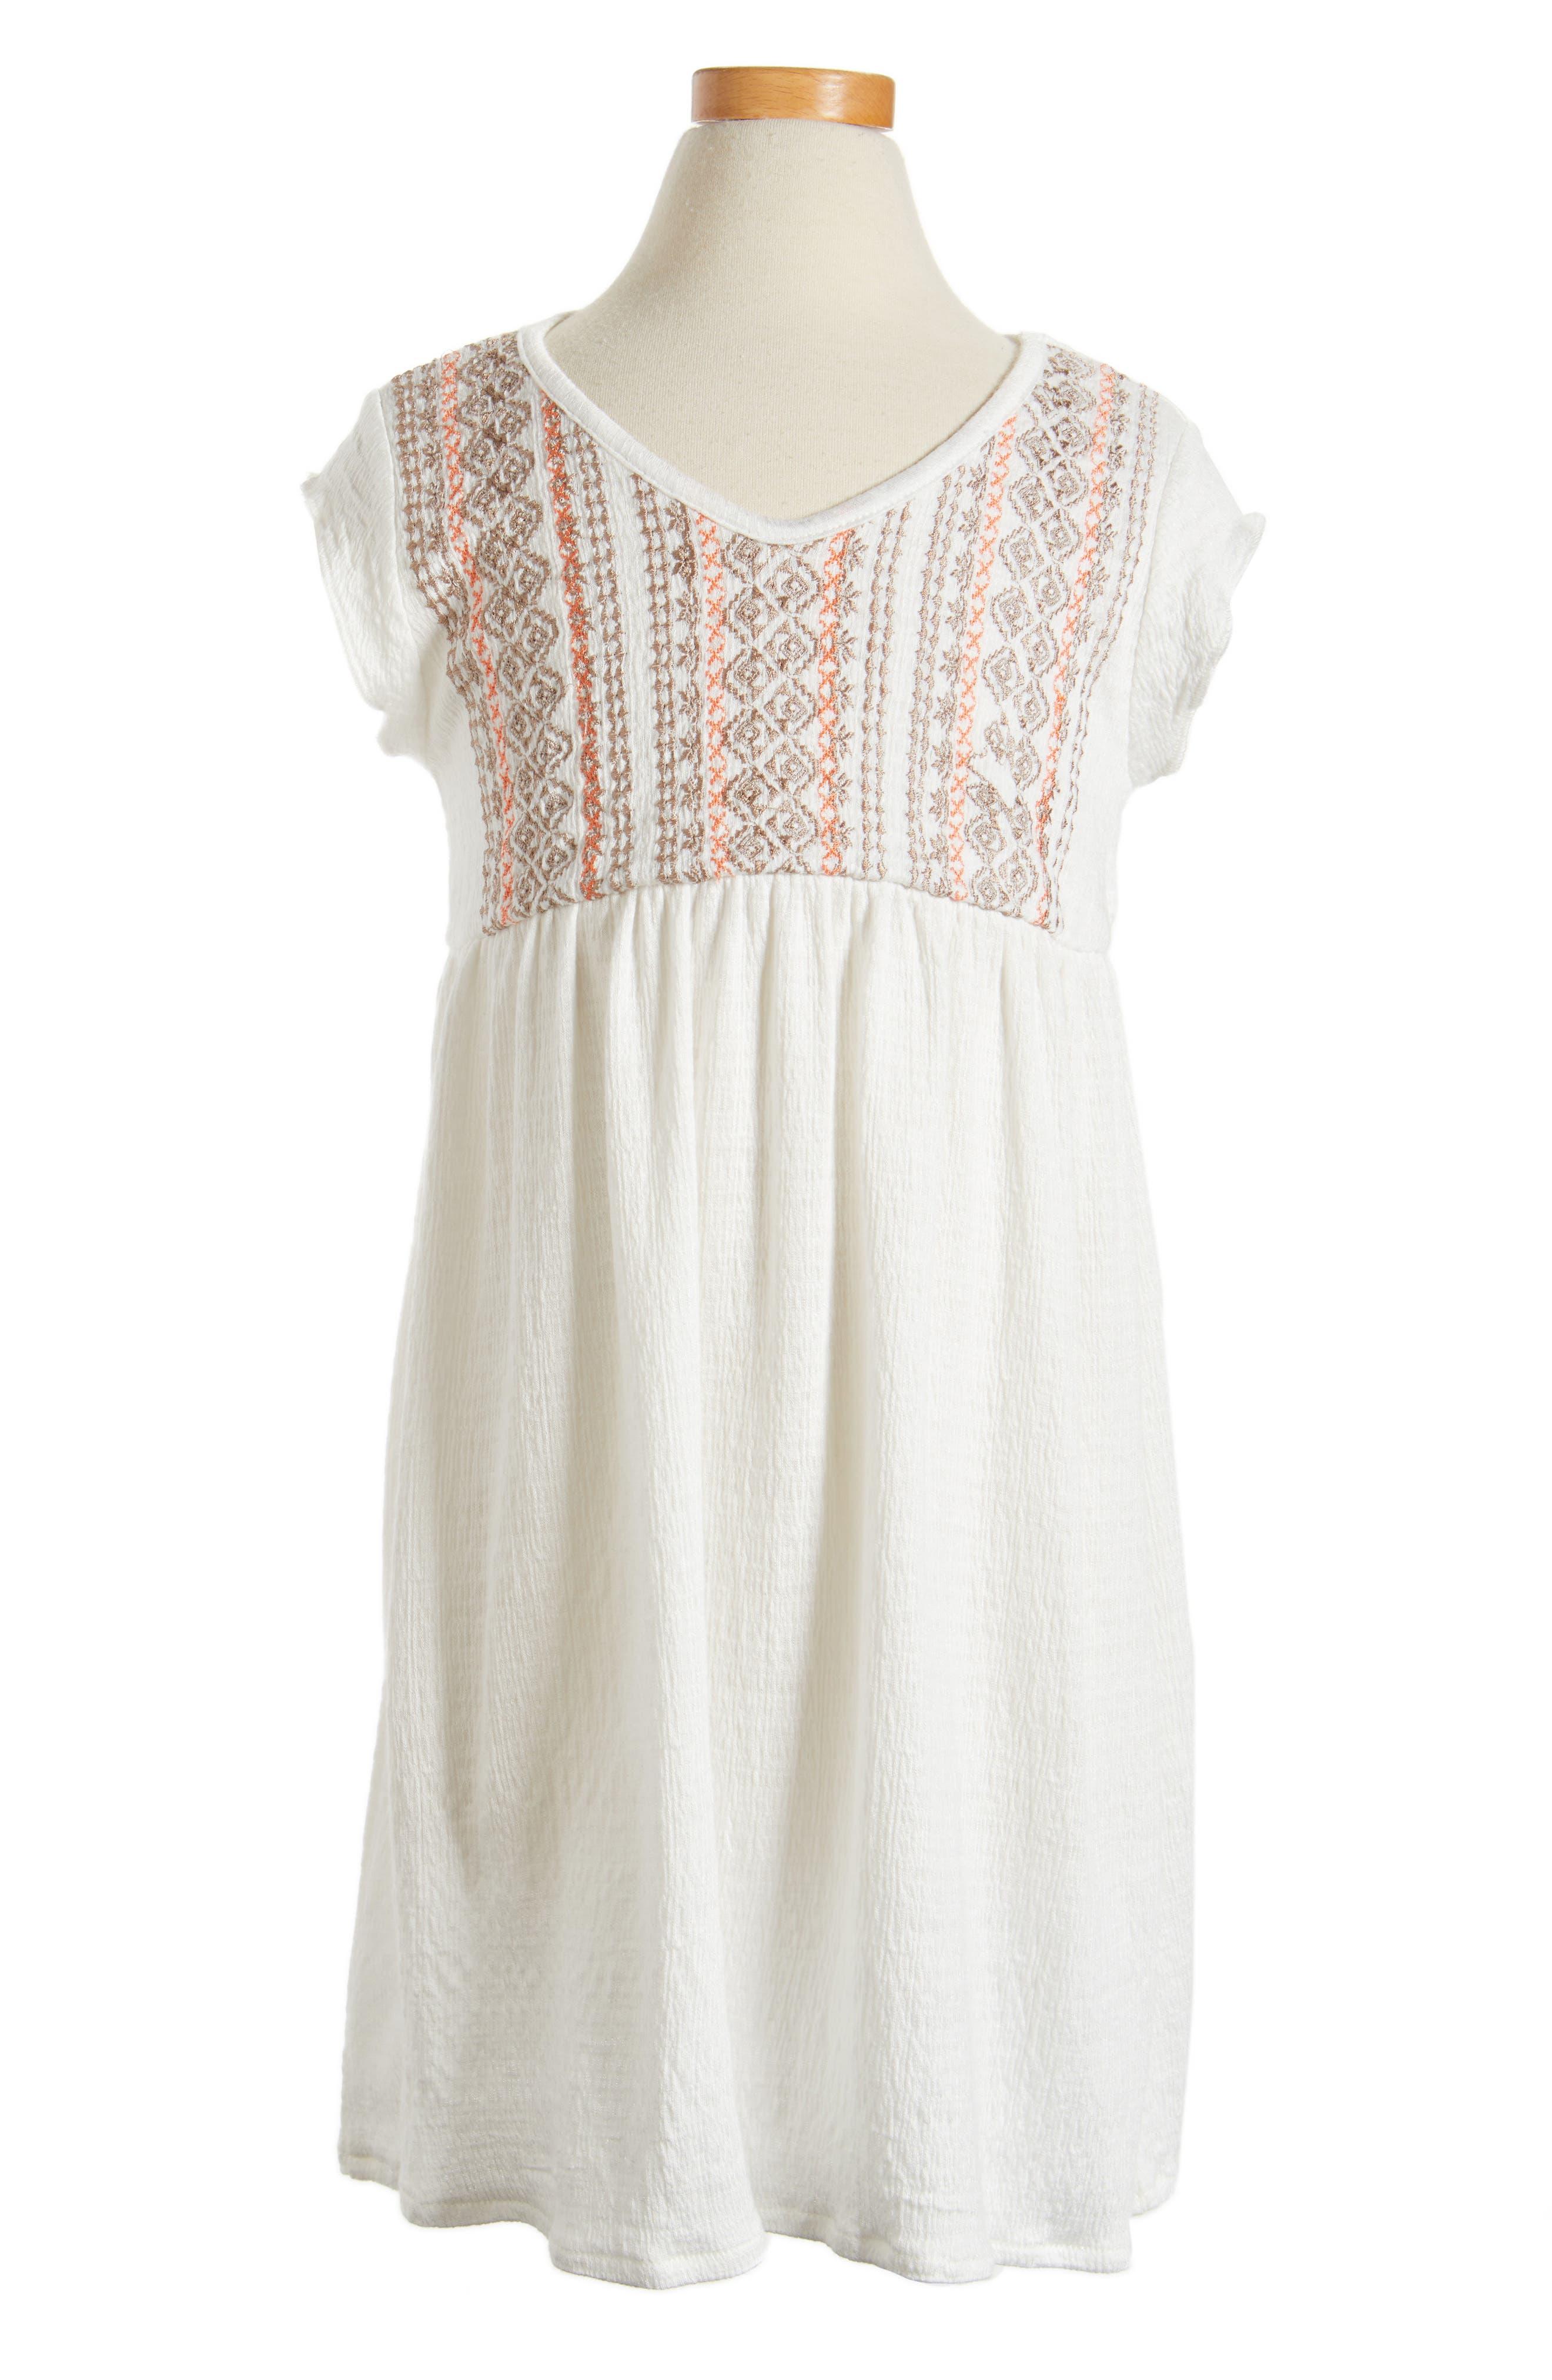 Alternate Image 1 Selected - O'Neill Sandie Embroidered Dress (Toddler Girls & Little Girls)